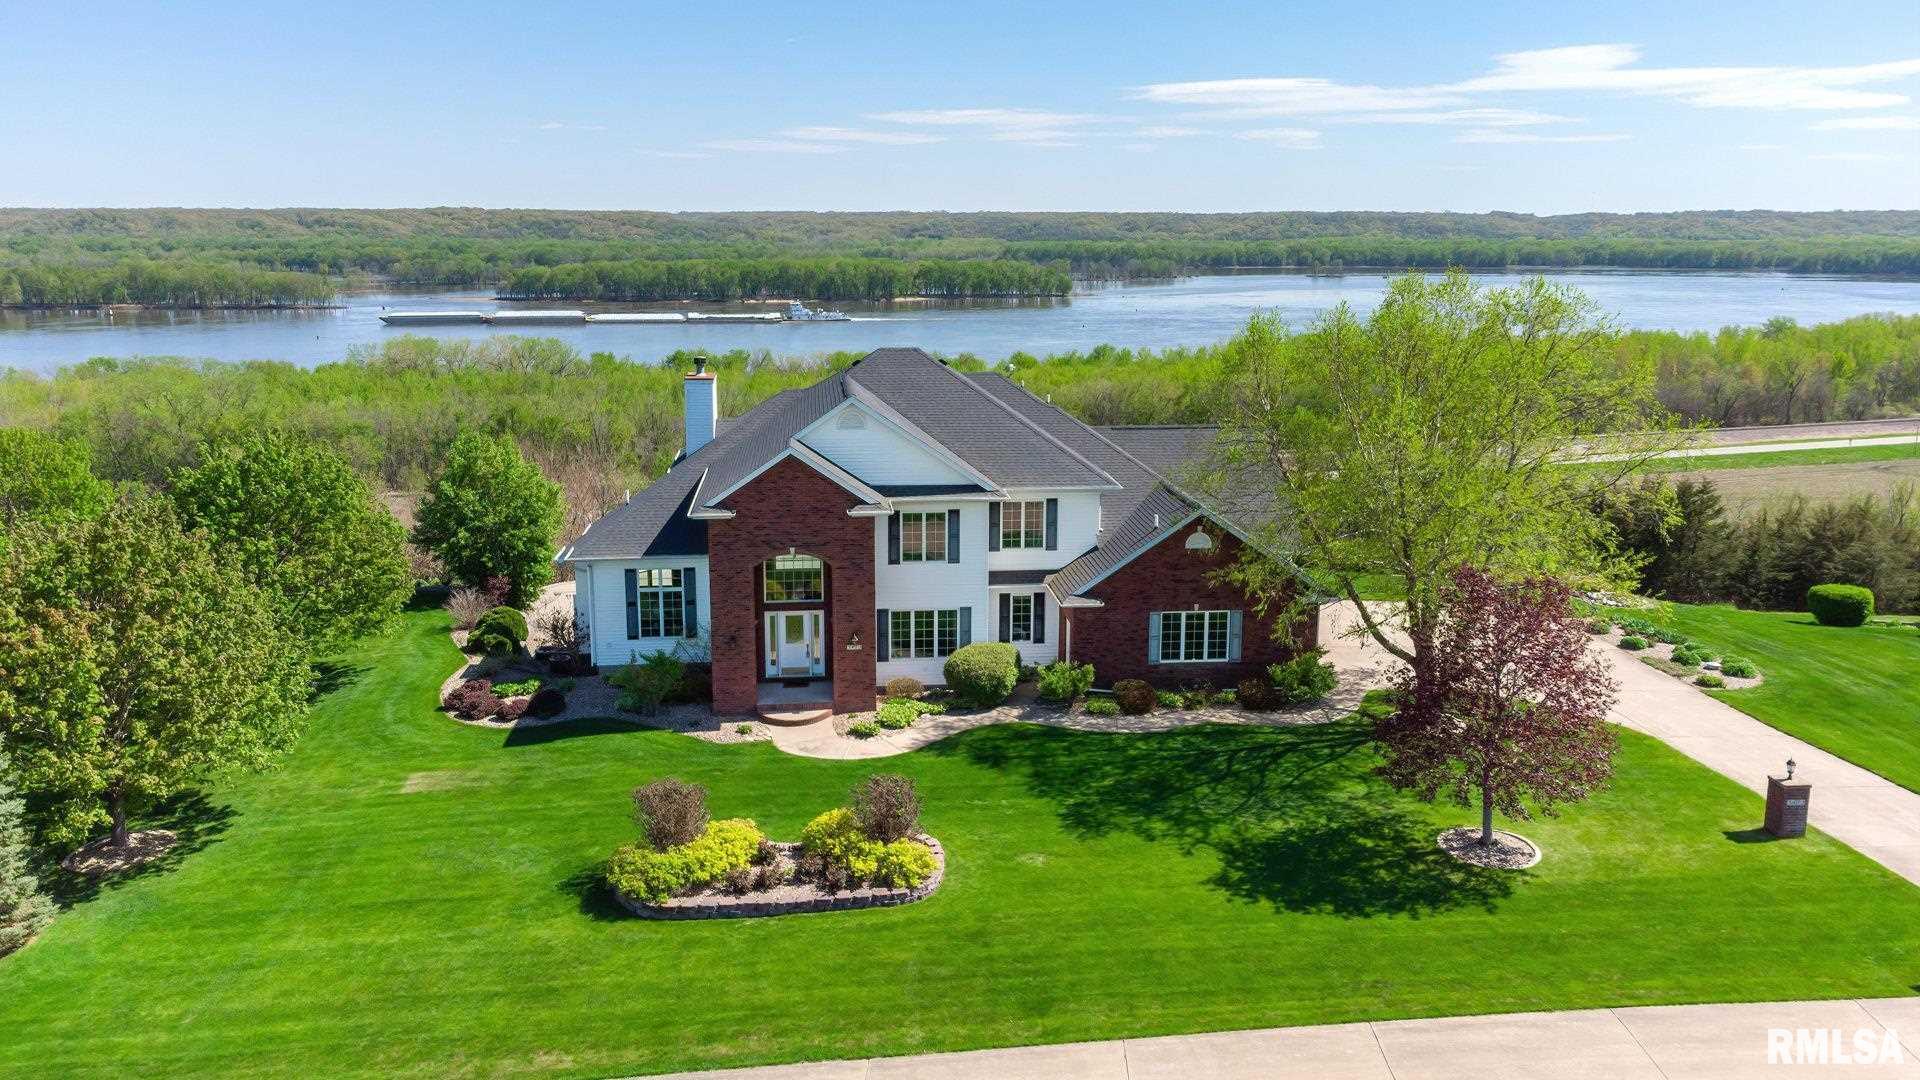 3472 BIG SKY Property Photo - Muscatine, IA real estate listing